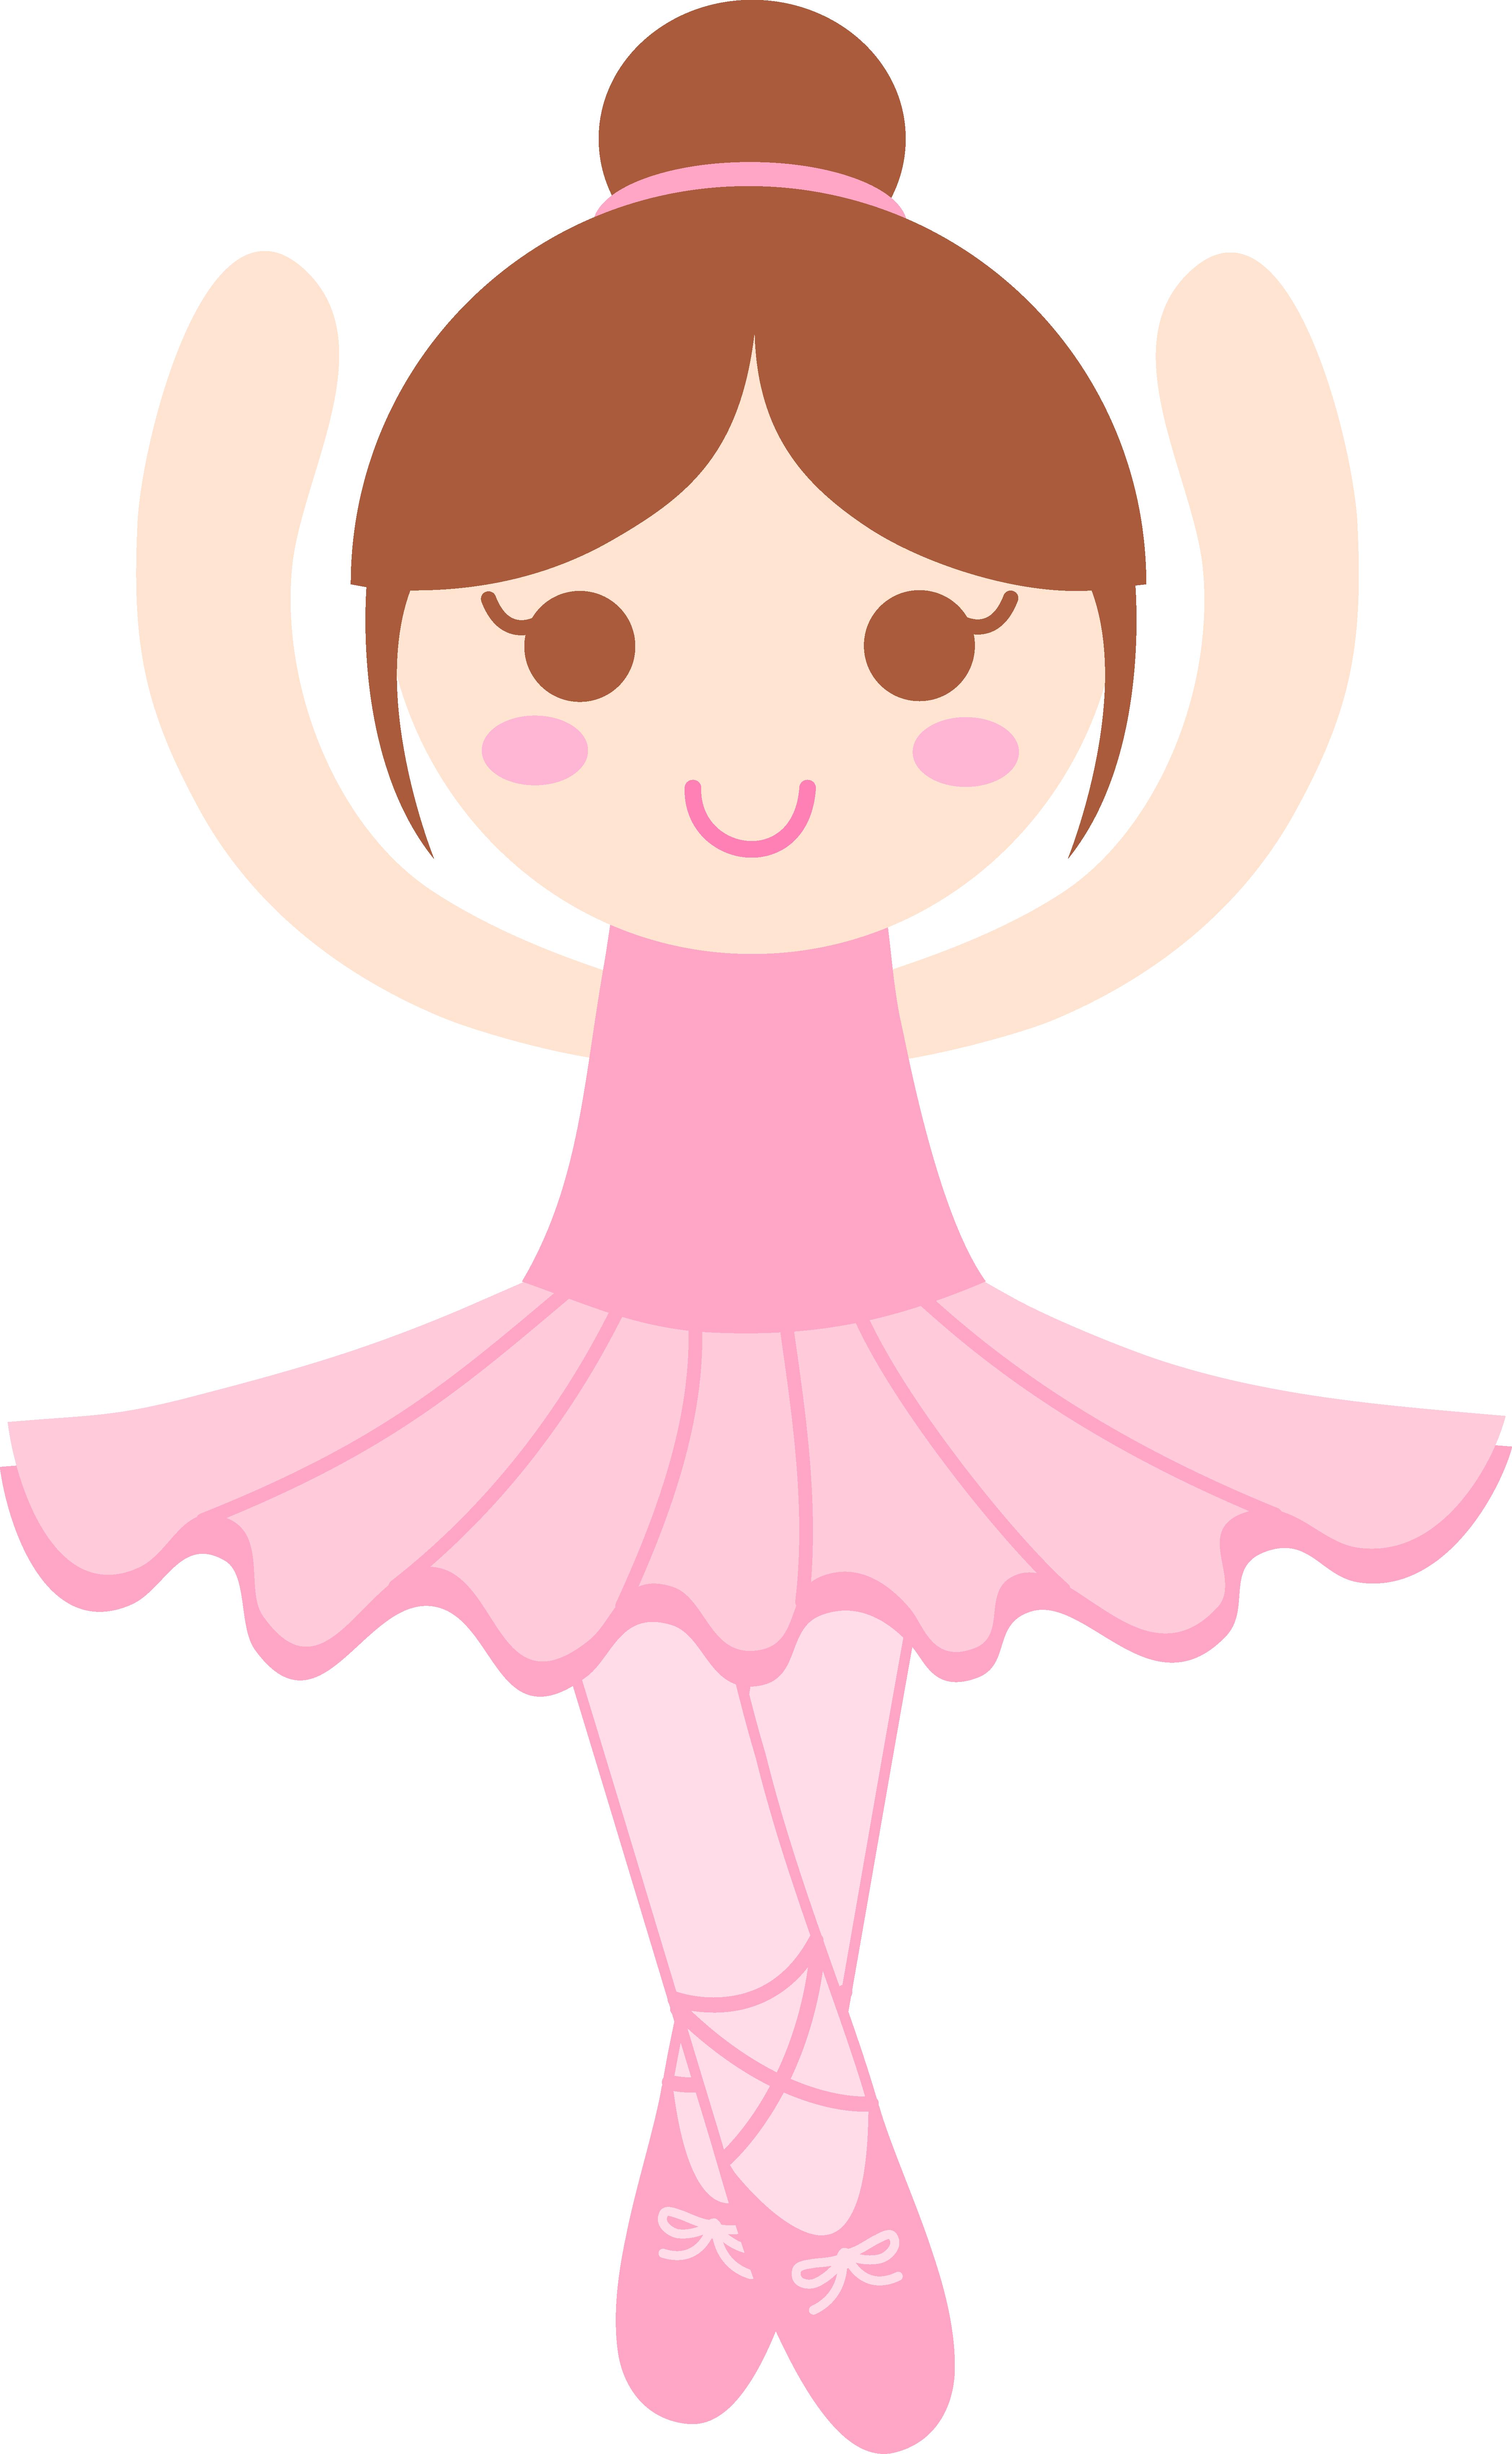 image library download Dancer clipart. Little girl ballerina .